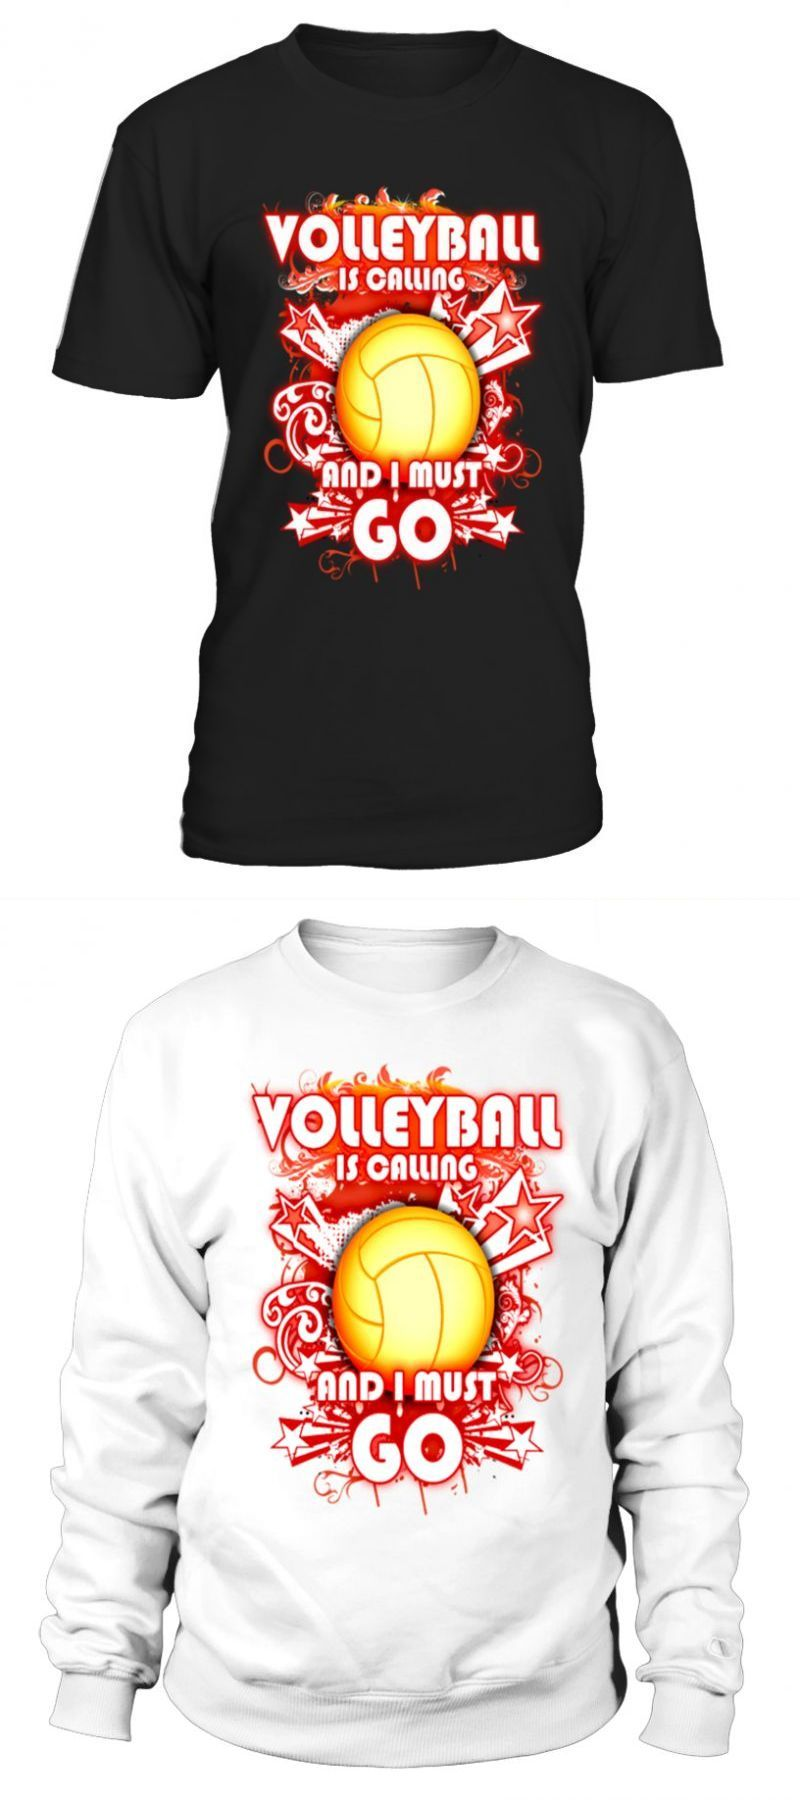 Volleyball Tshirt Designs Sports Volleyball 2017 Volleyball Camp T Shirt Volleyball Tshirt Designs Volleyball Tshirts Volleyball Camp